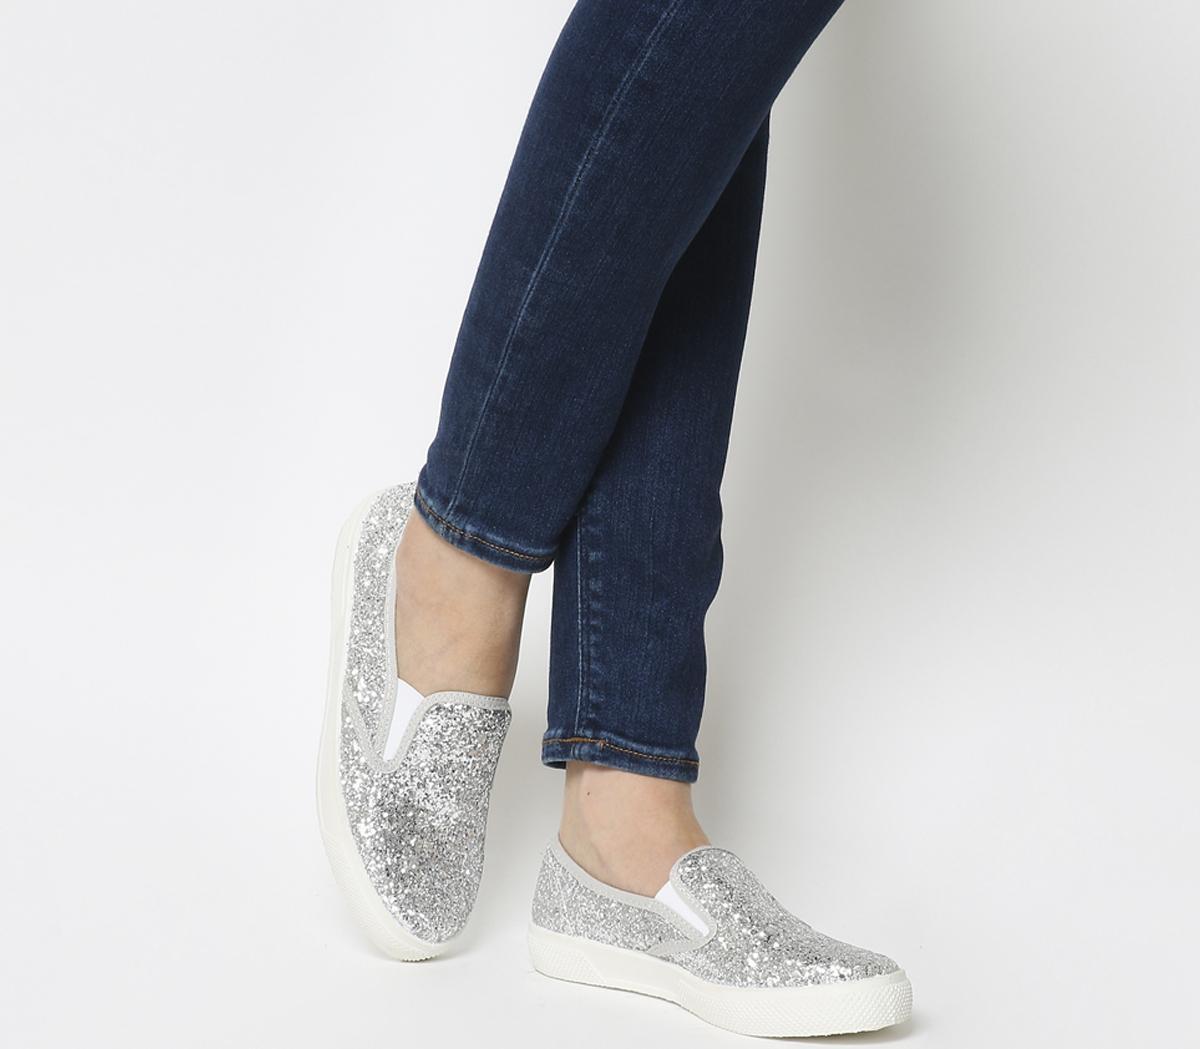 Kicker Slip On Shoes